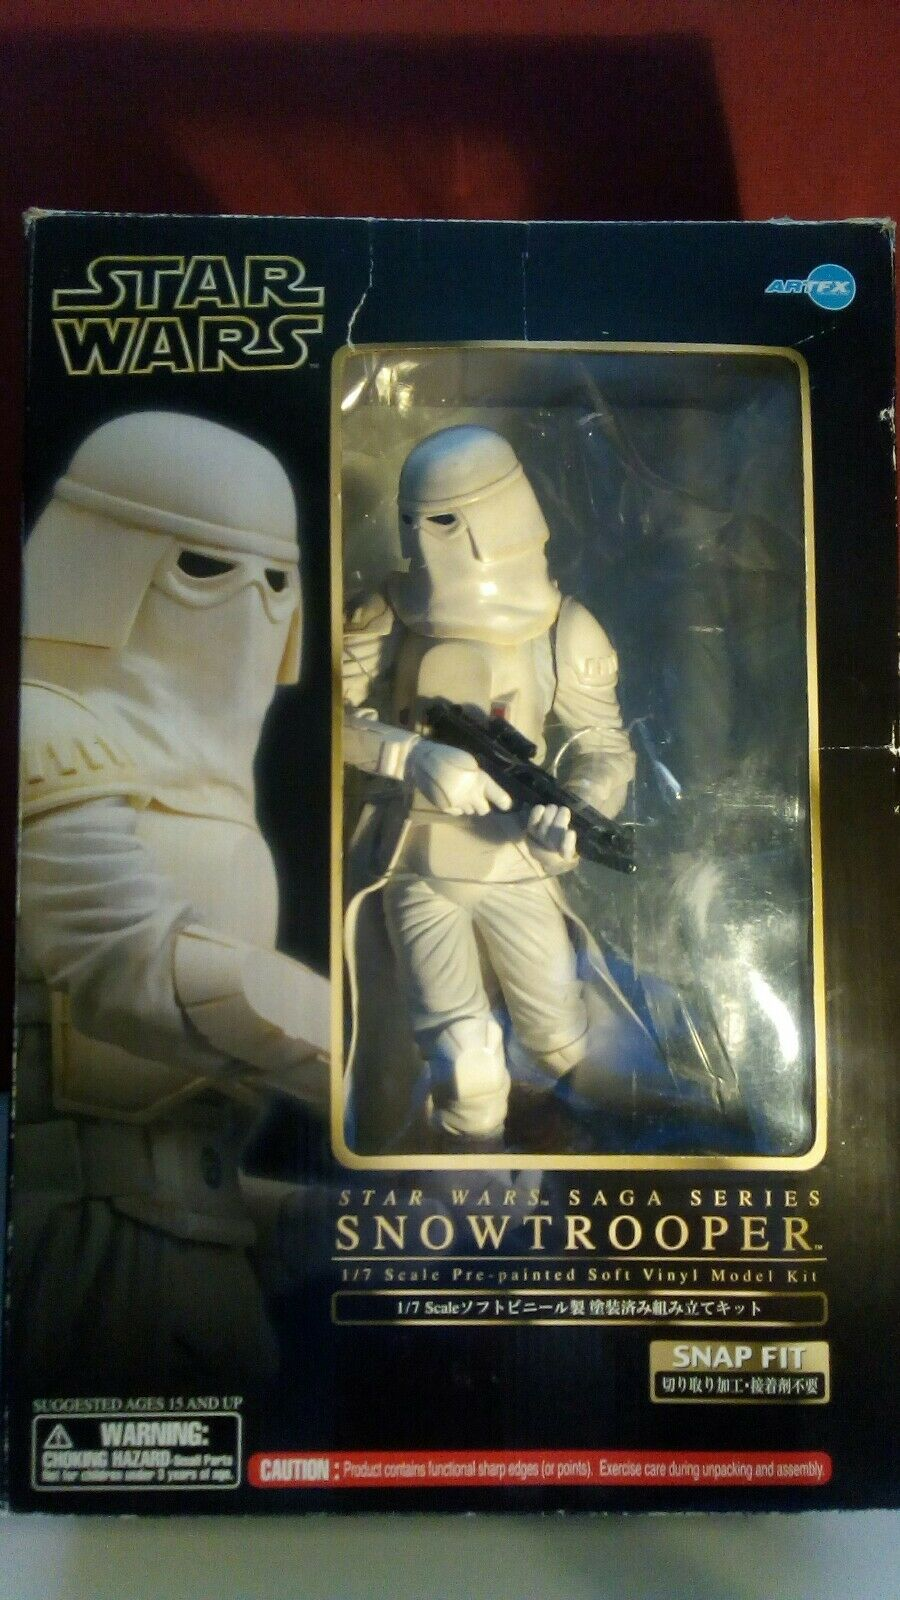 Kotobukiya ArtFX Classic Star Wars Series Snowtrooper 1:7 Figure